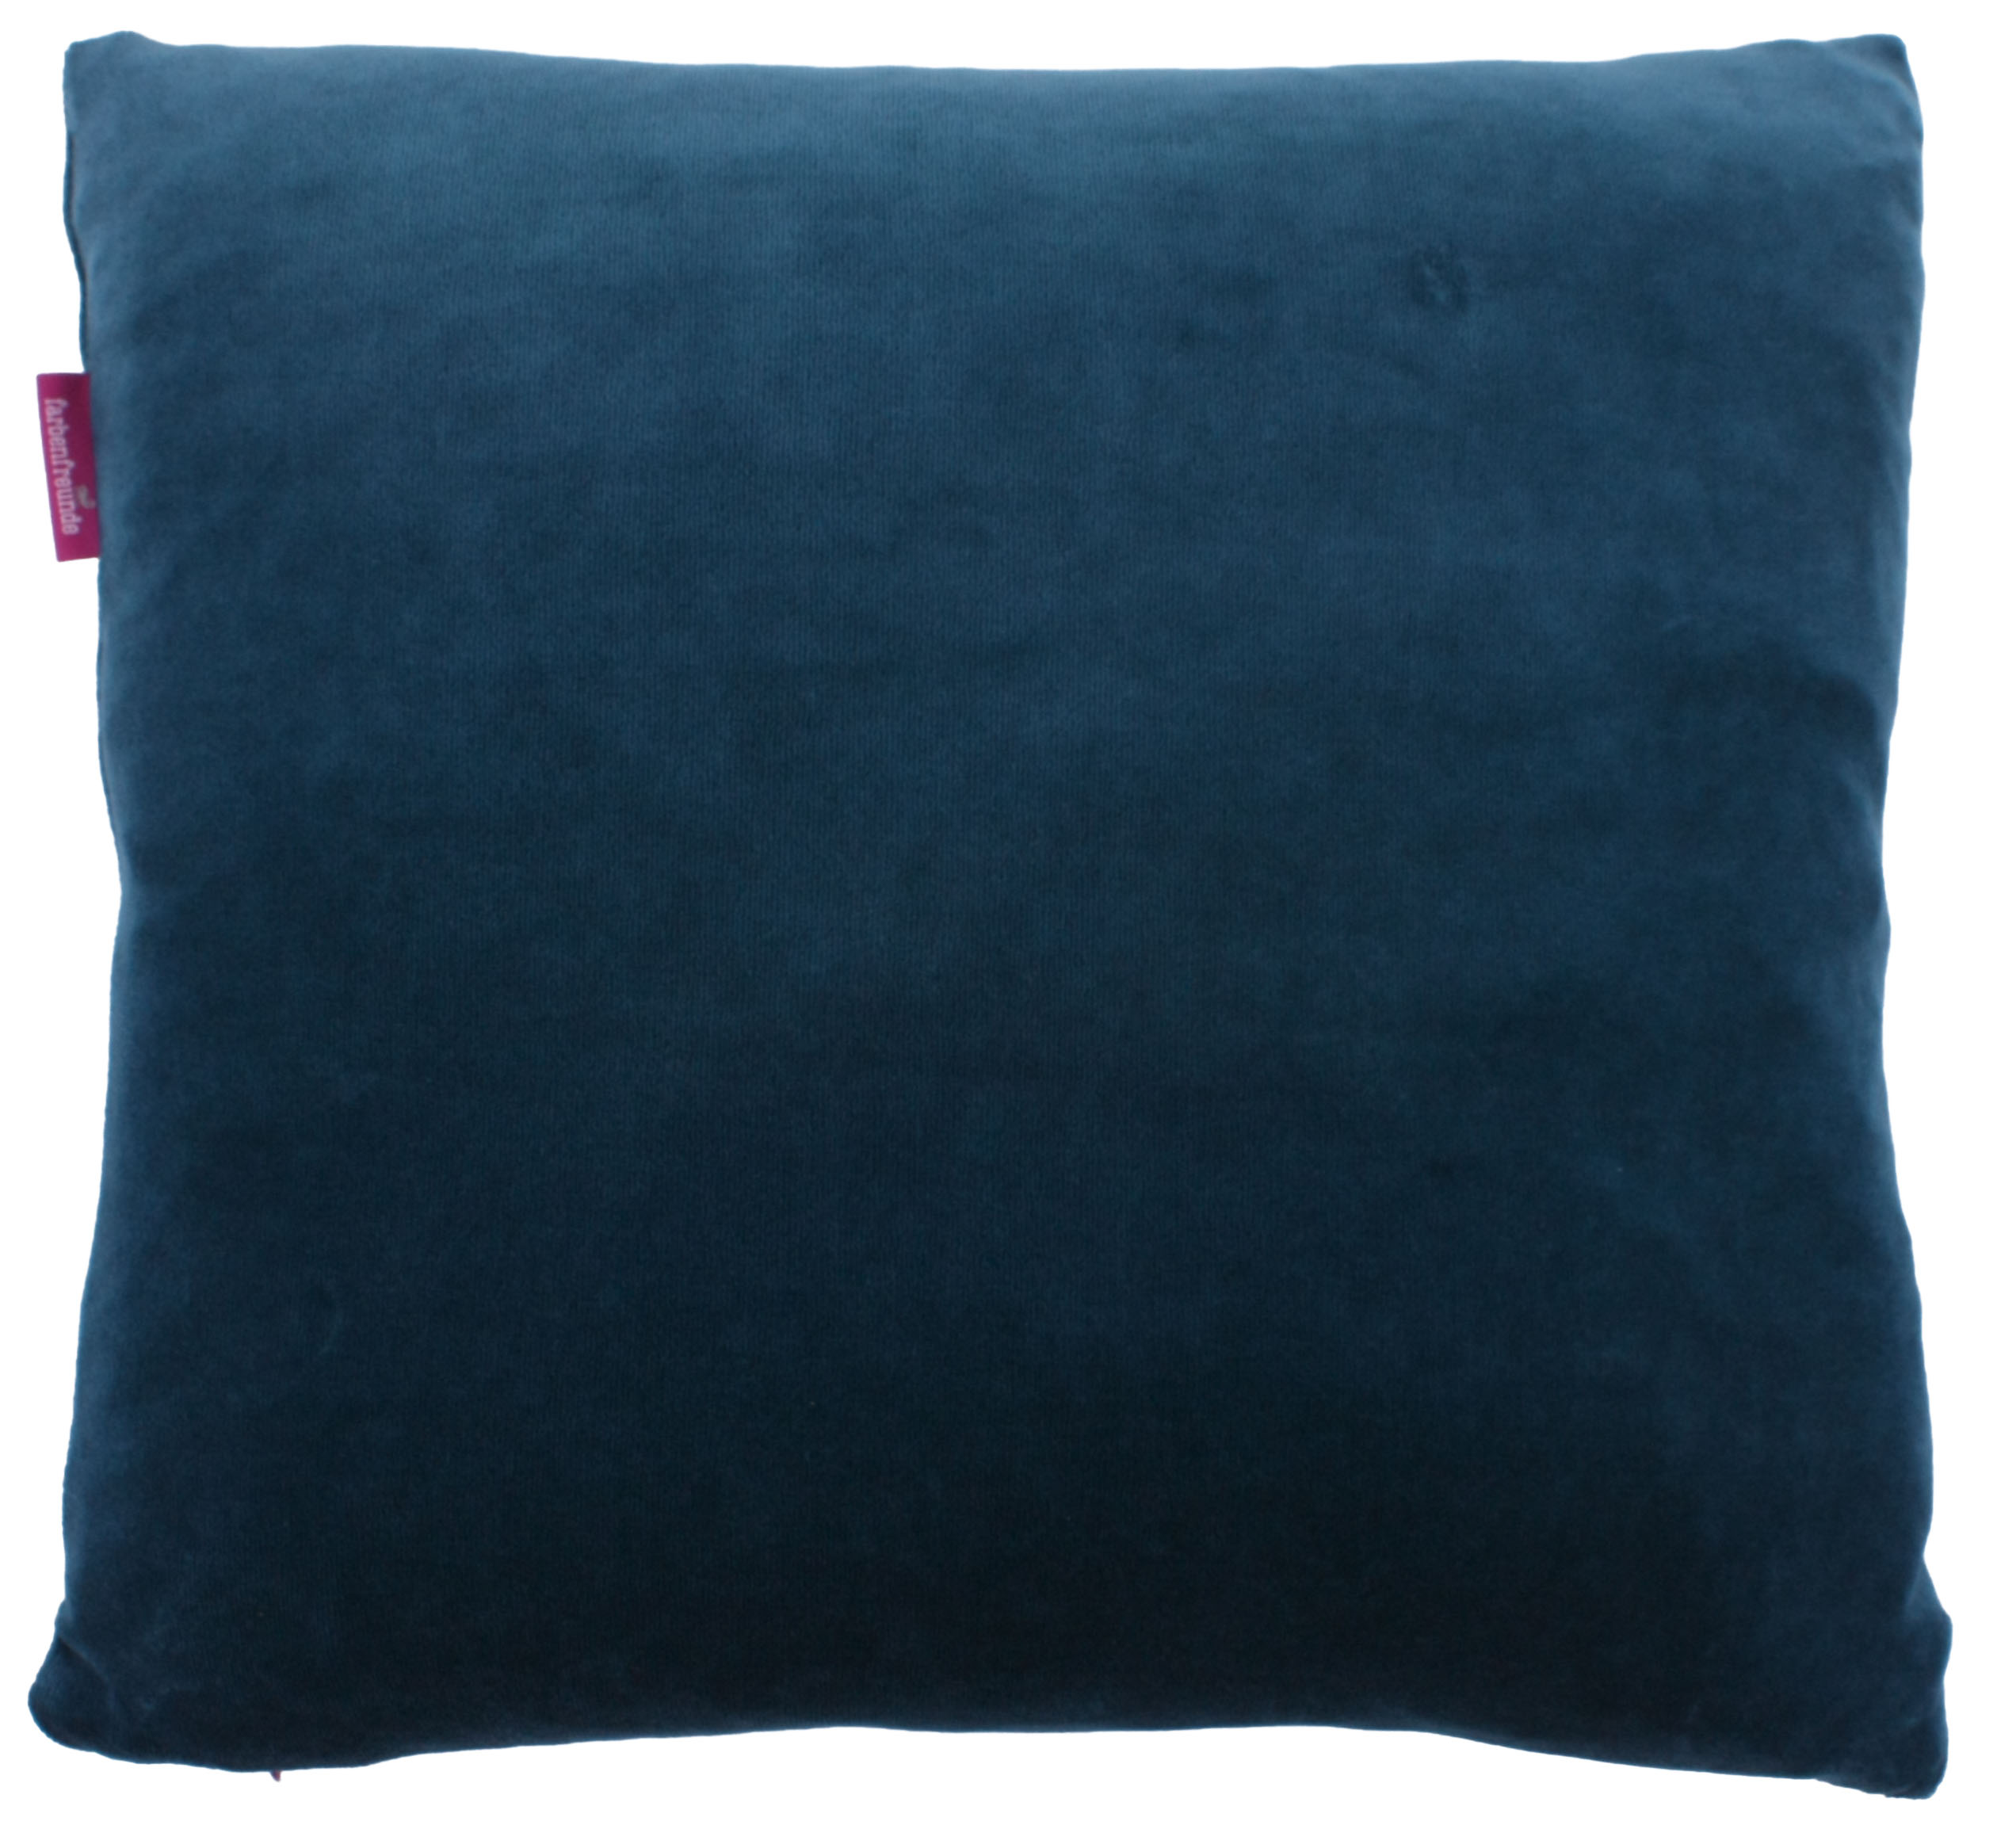 kissenh lle farbenfreunde 40x40 cm winterpetrol der bettenhaus online shop. Black Bedroom Furniture Sets. Home Design Ideas